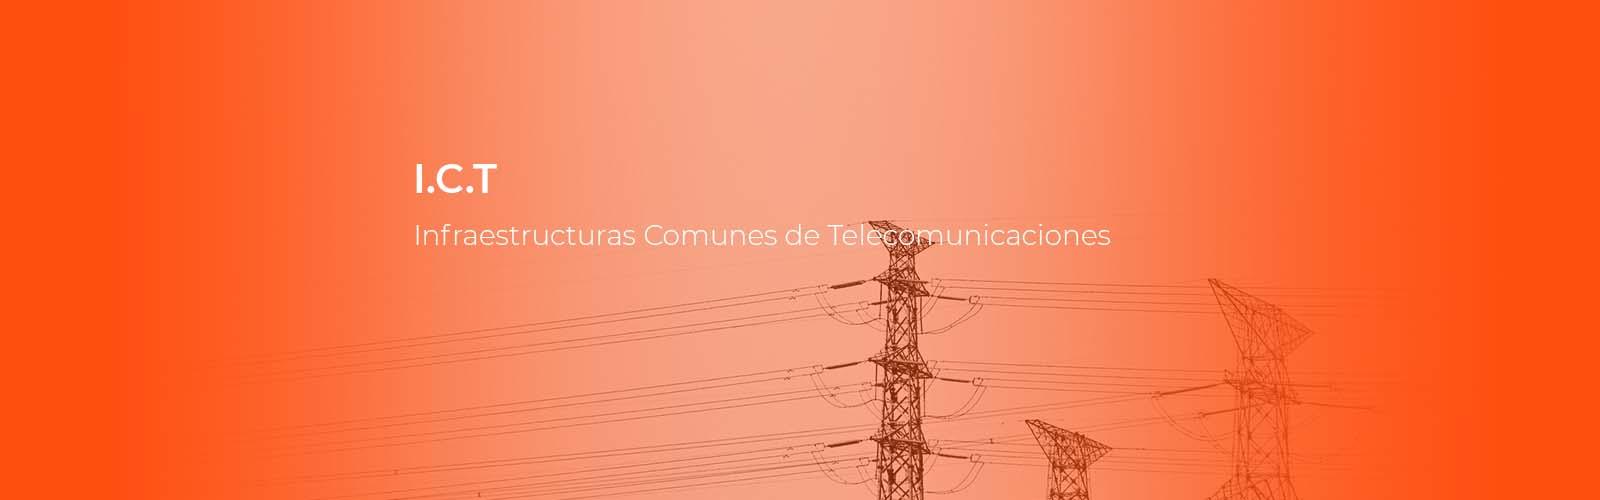 Material eléctrico ICT